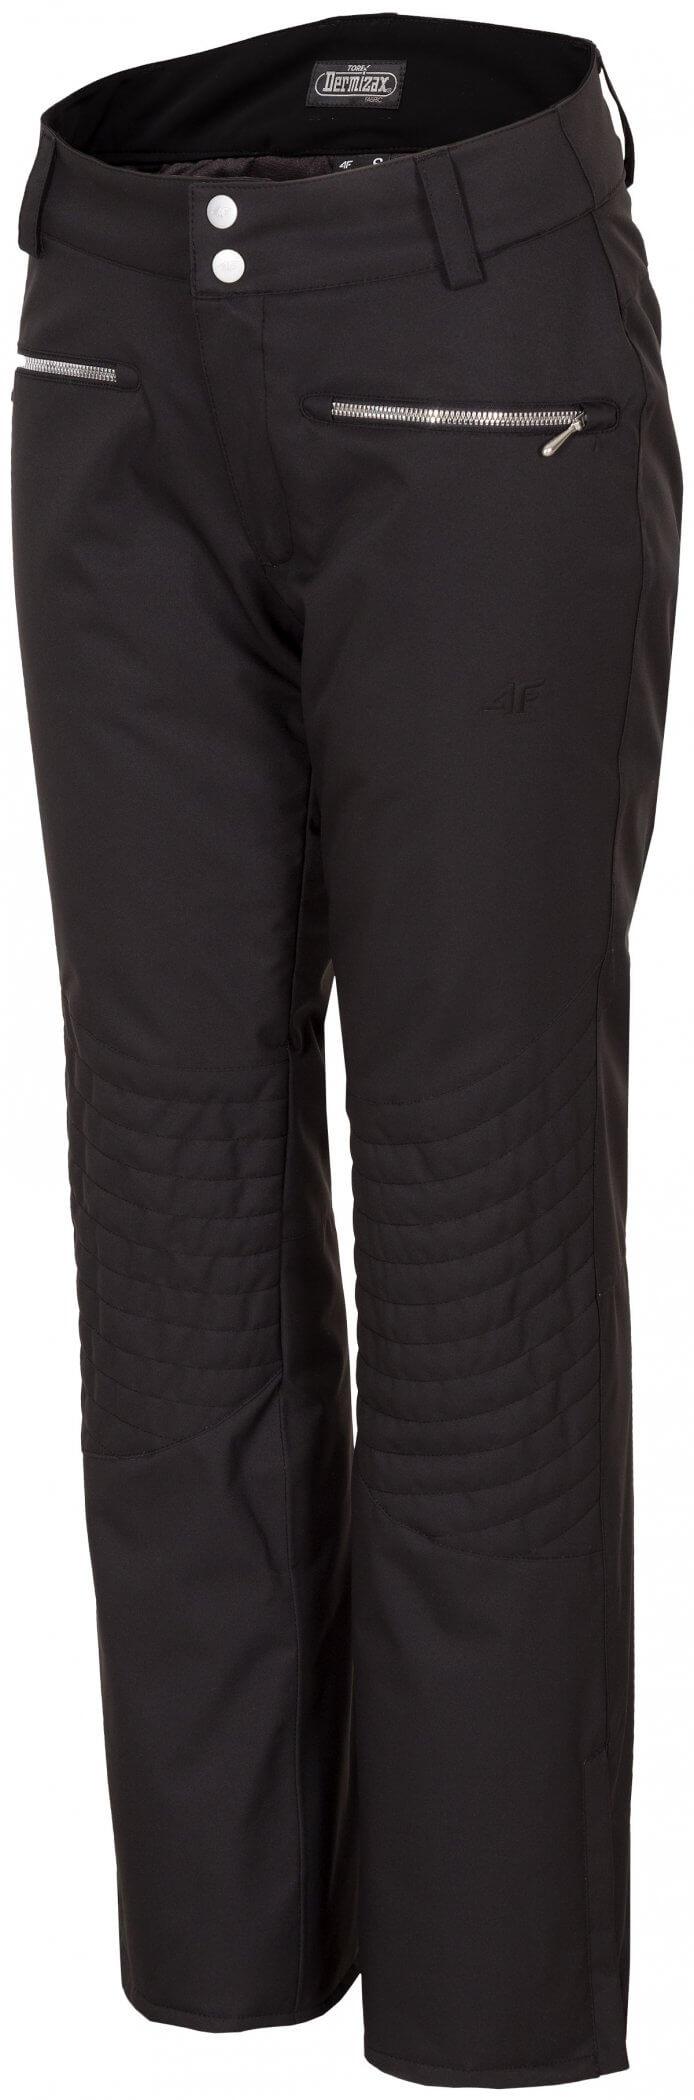 Spodnie narciarskie damskie SPDN151z - czarny